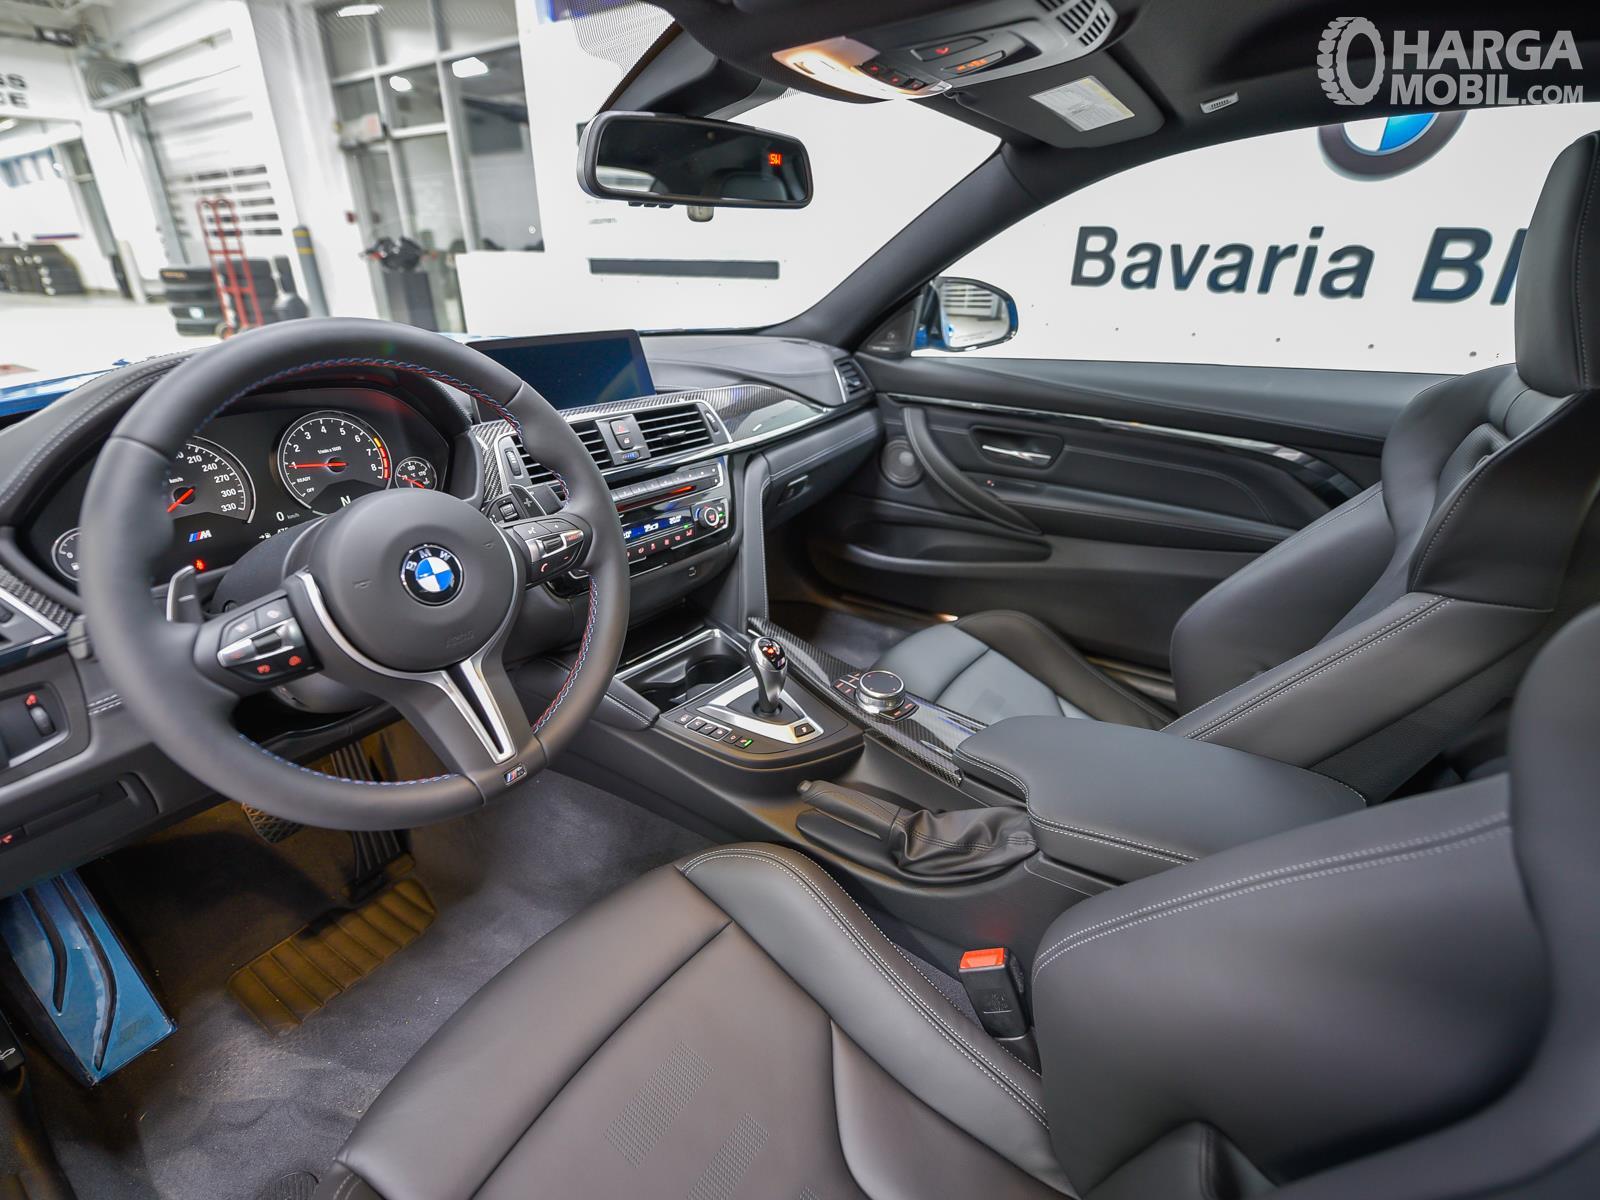 Foto kabin New BMW M4 CS RWD Coupe 2019 - mewah dan sporty